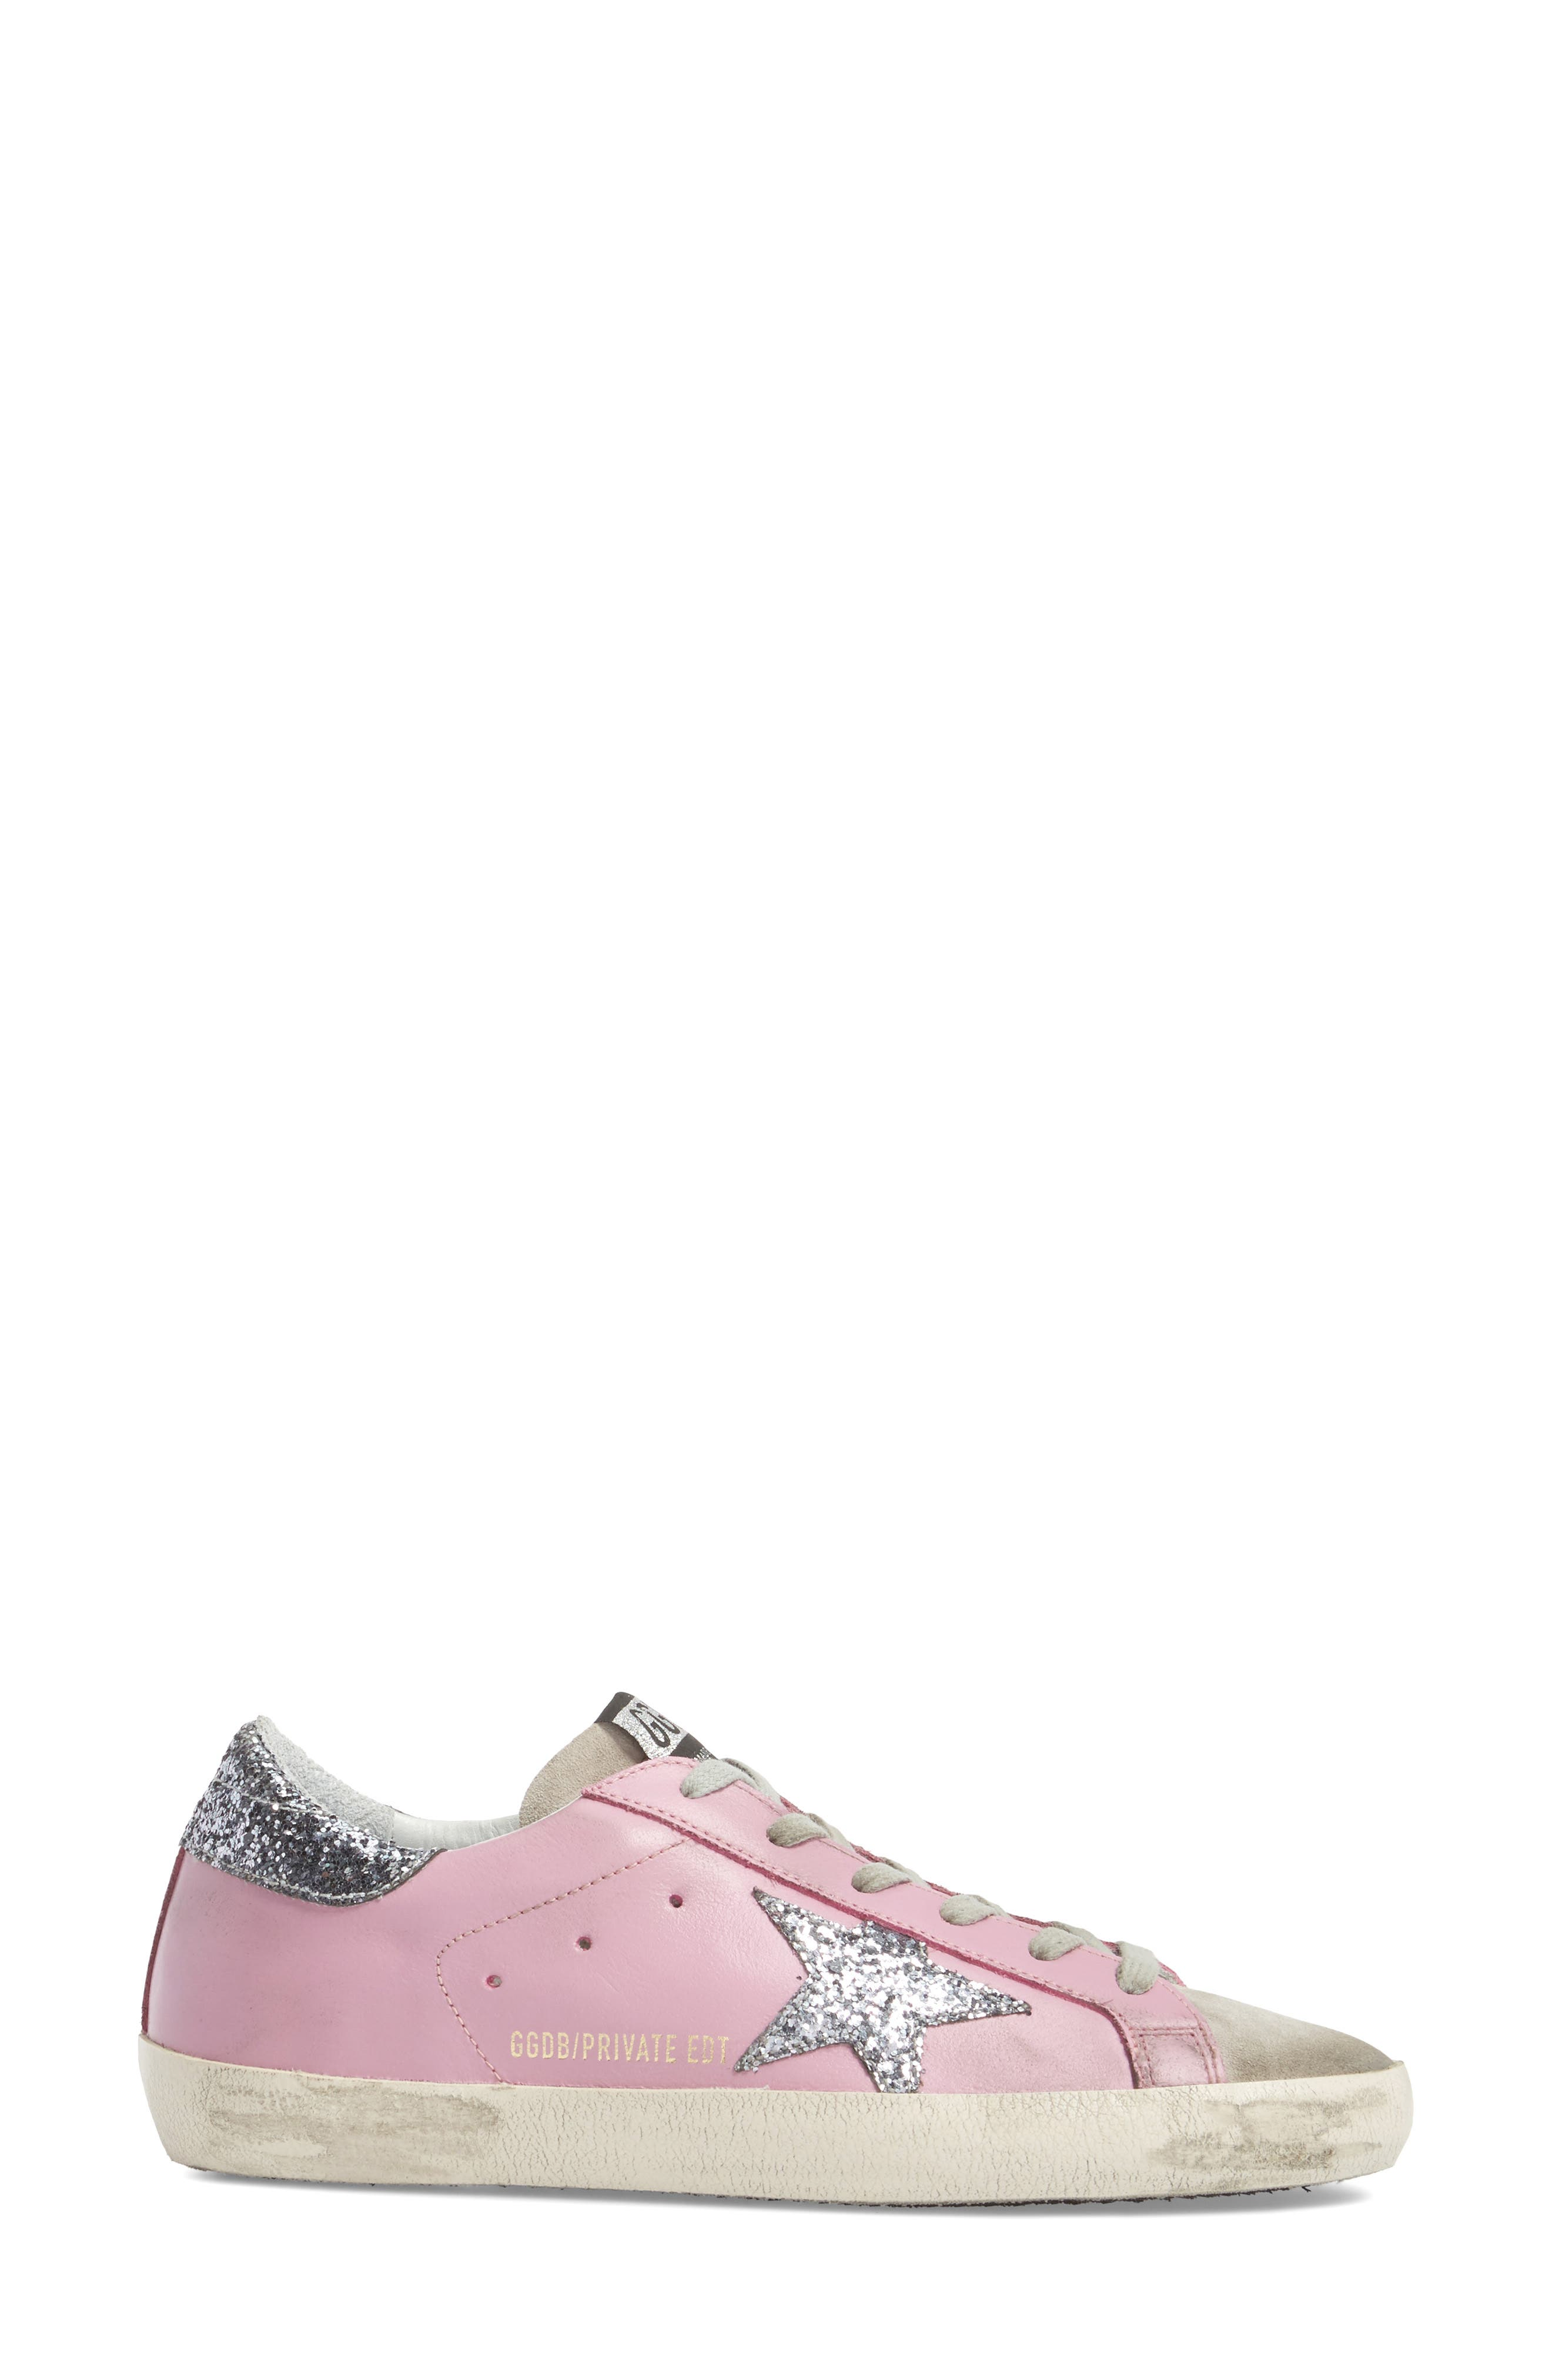 Superstar Low Top Sneaker,                             Alternate thumbnail 3, color,                             650